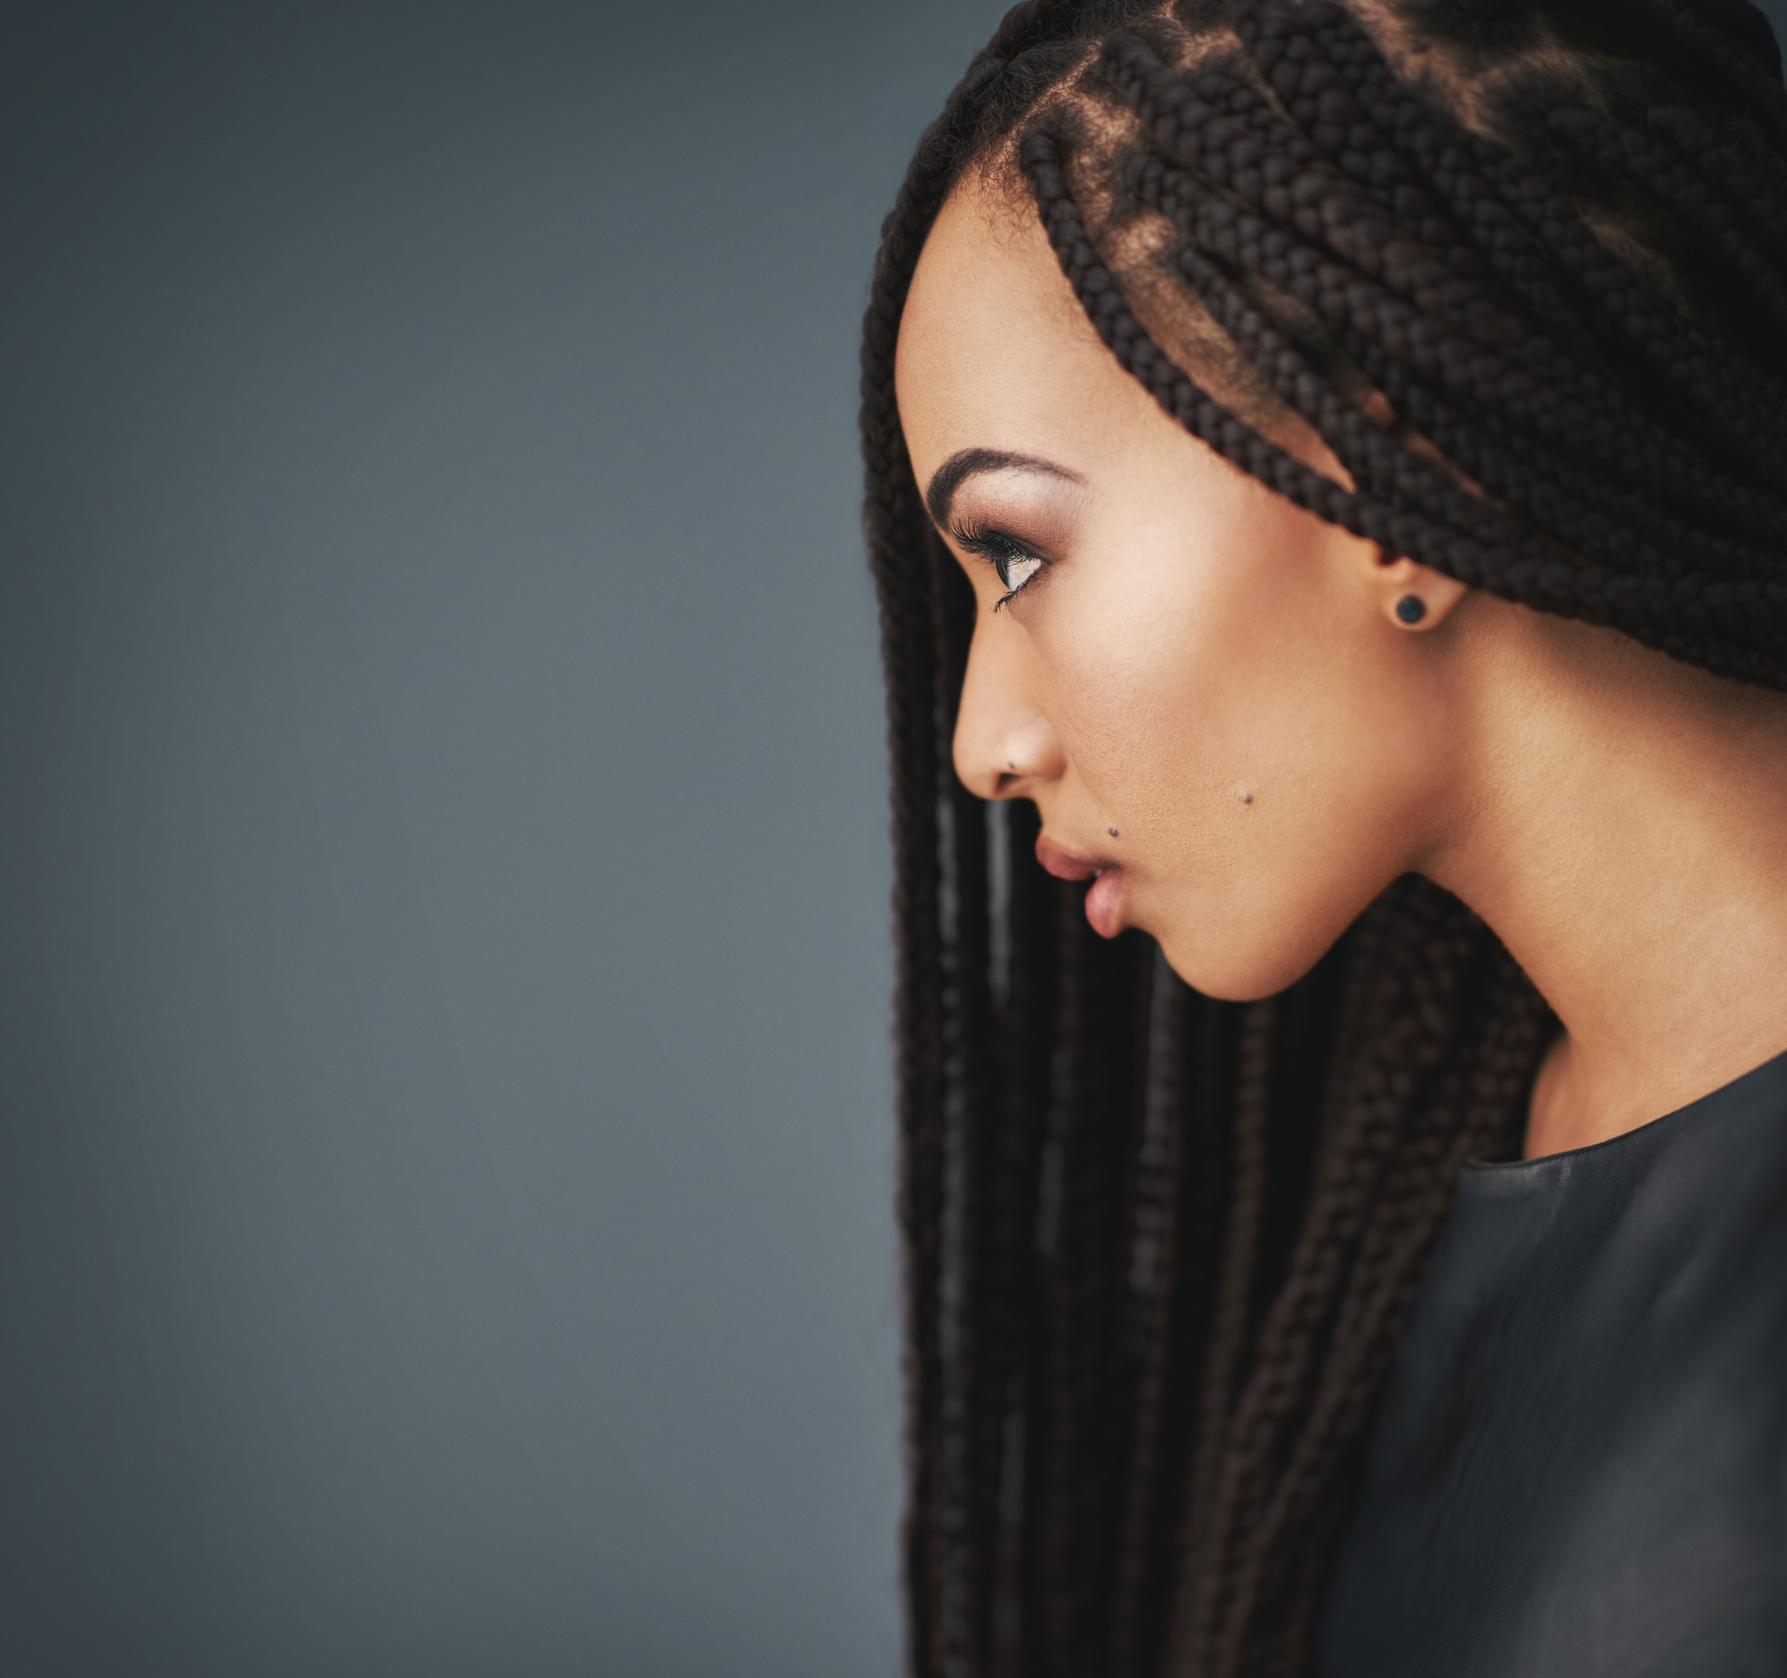 New York Bans Discrimination Against Natural Hair | 99.3-105.7 Kiss FM